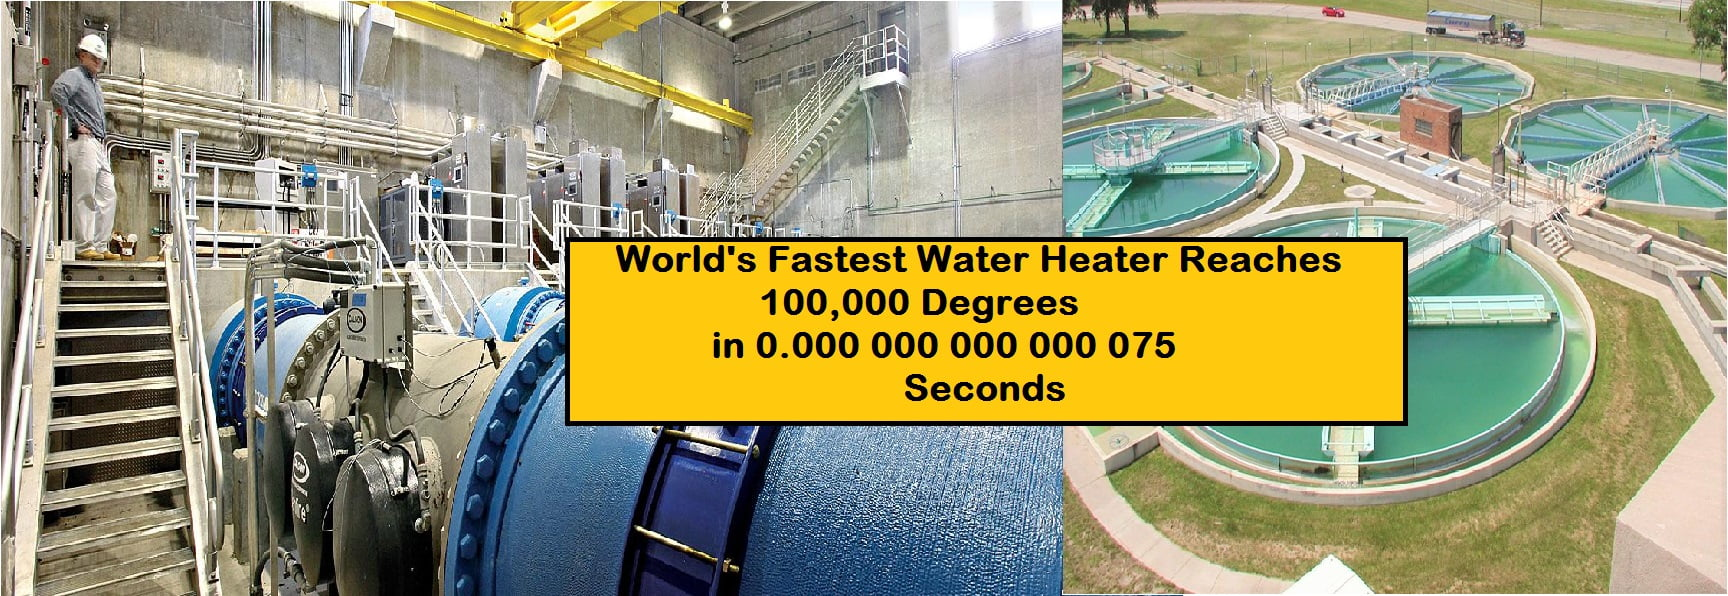 water heater, heater